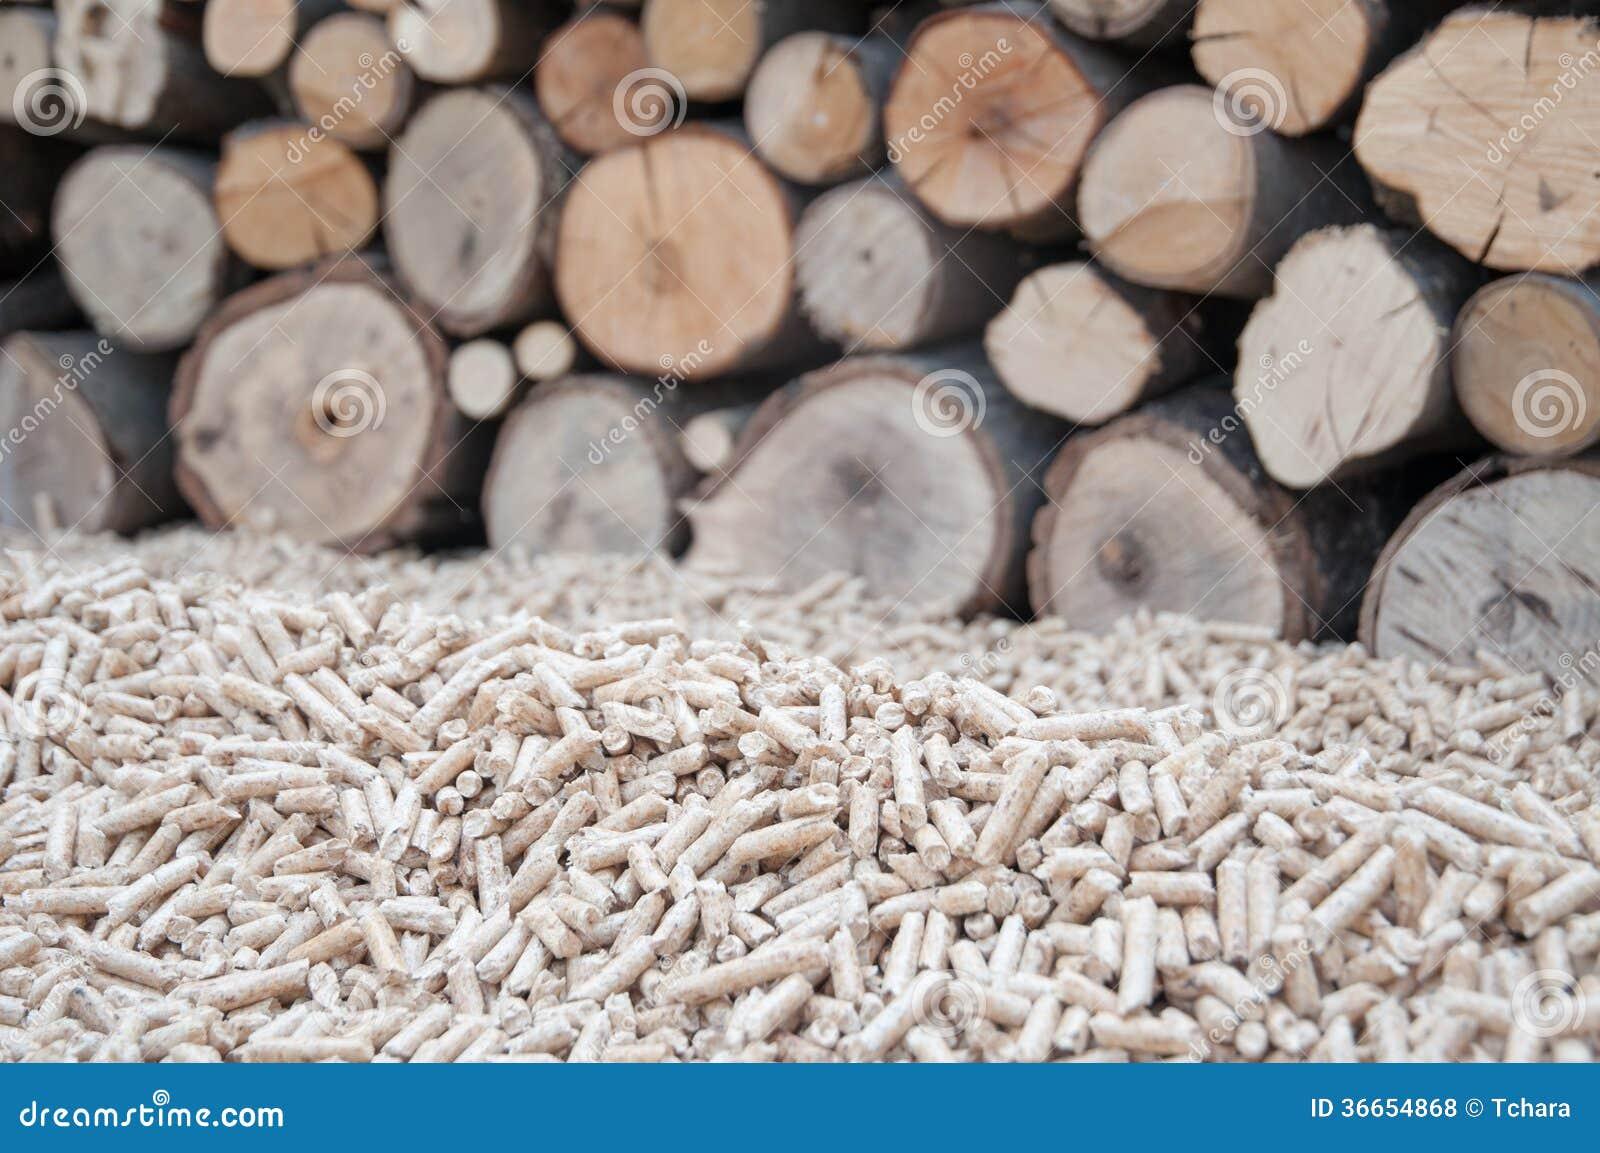 pellets biomass royalty free stock photos image 36654868. Black Bedroom Furniture Sets. Home Design Ideas